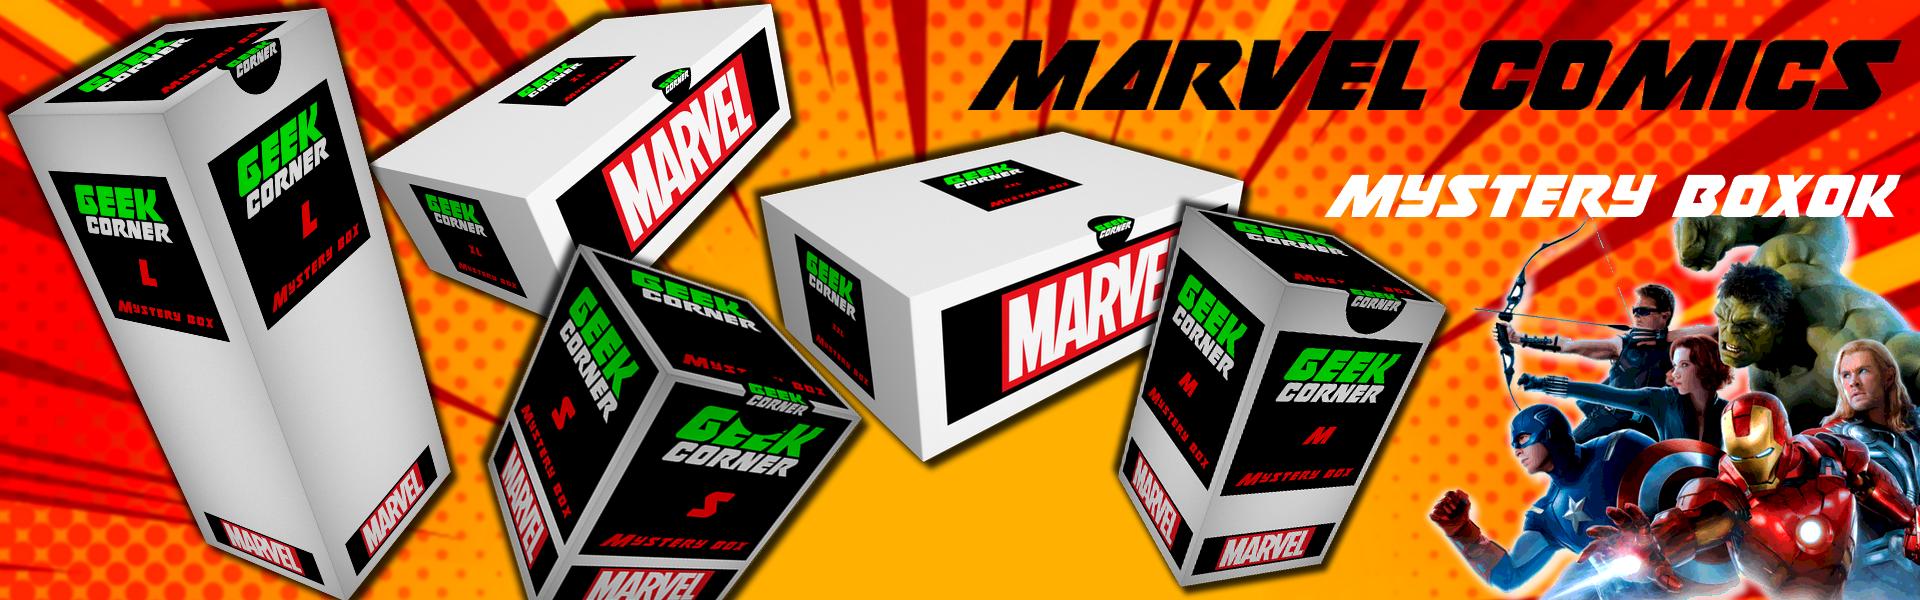 Marvel Mystery boxok